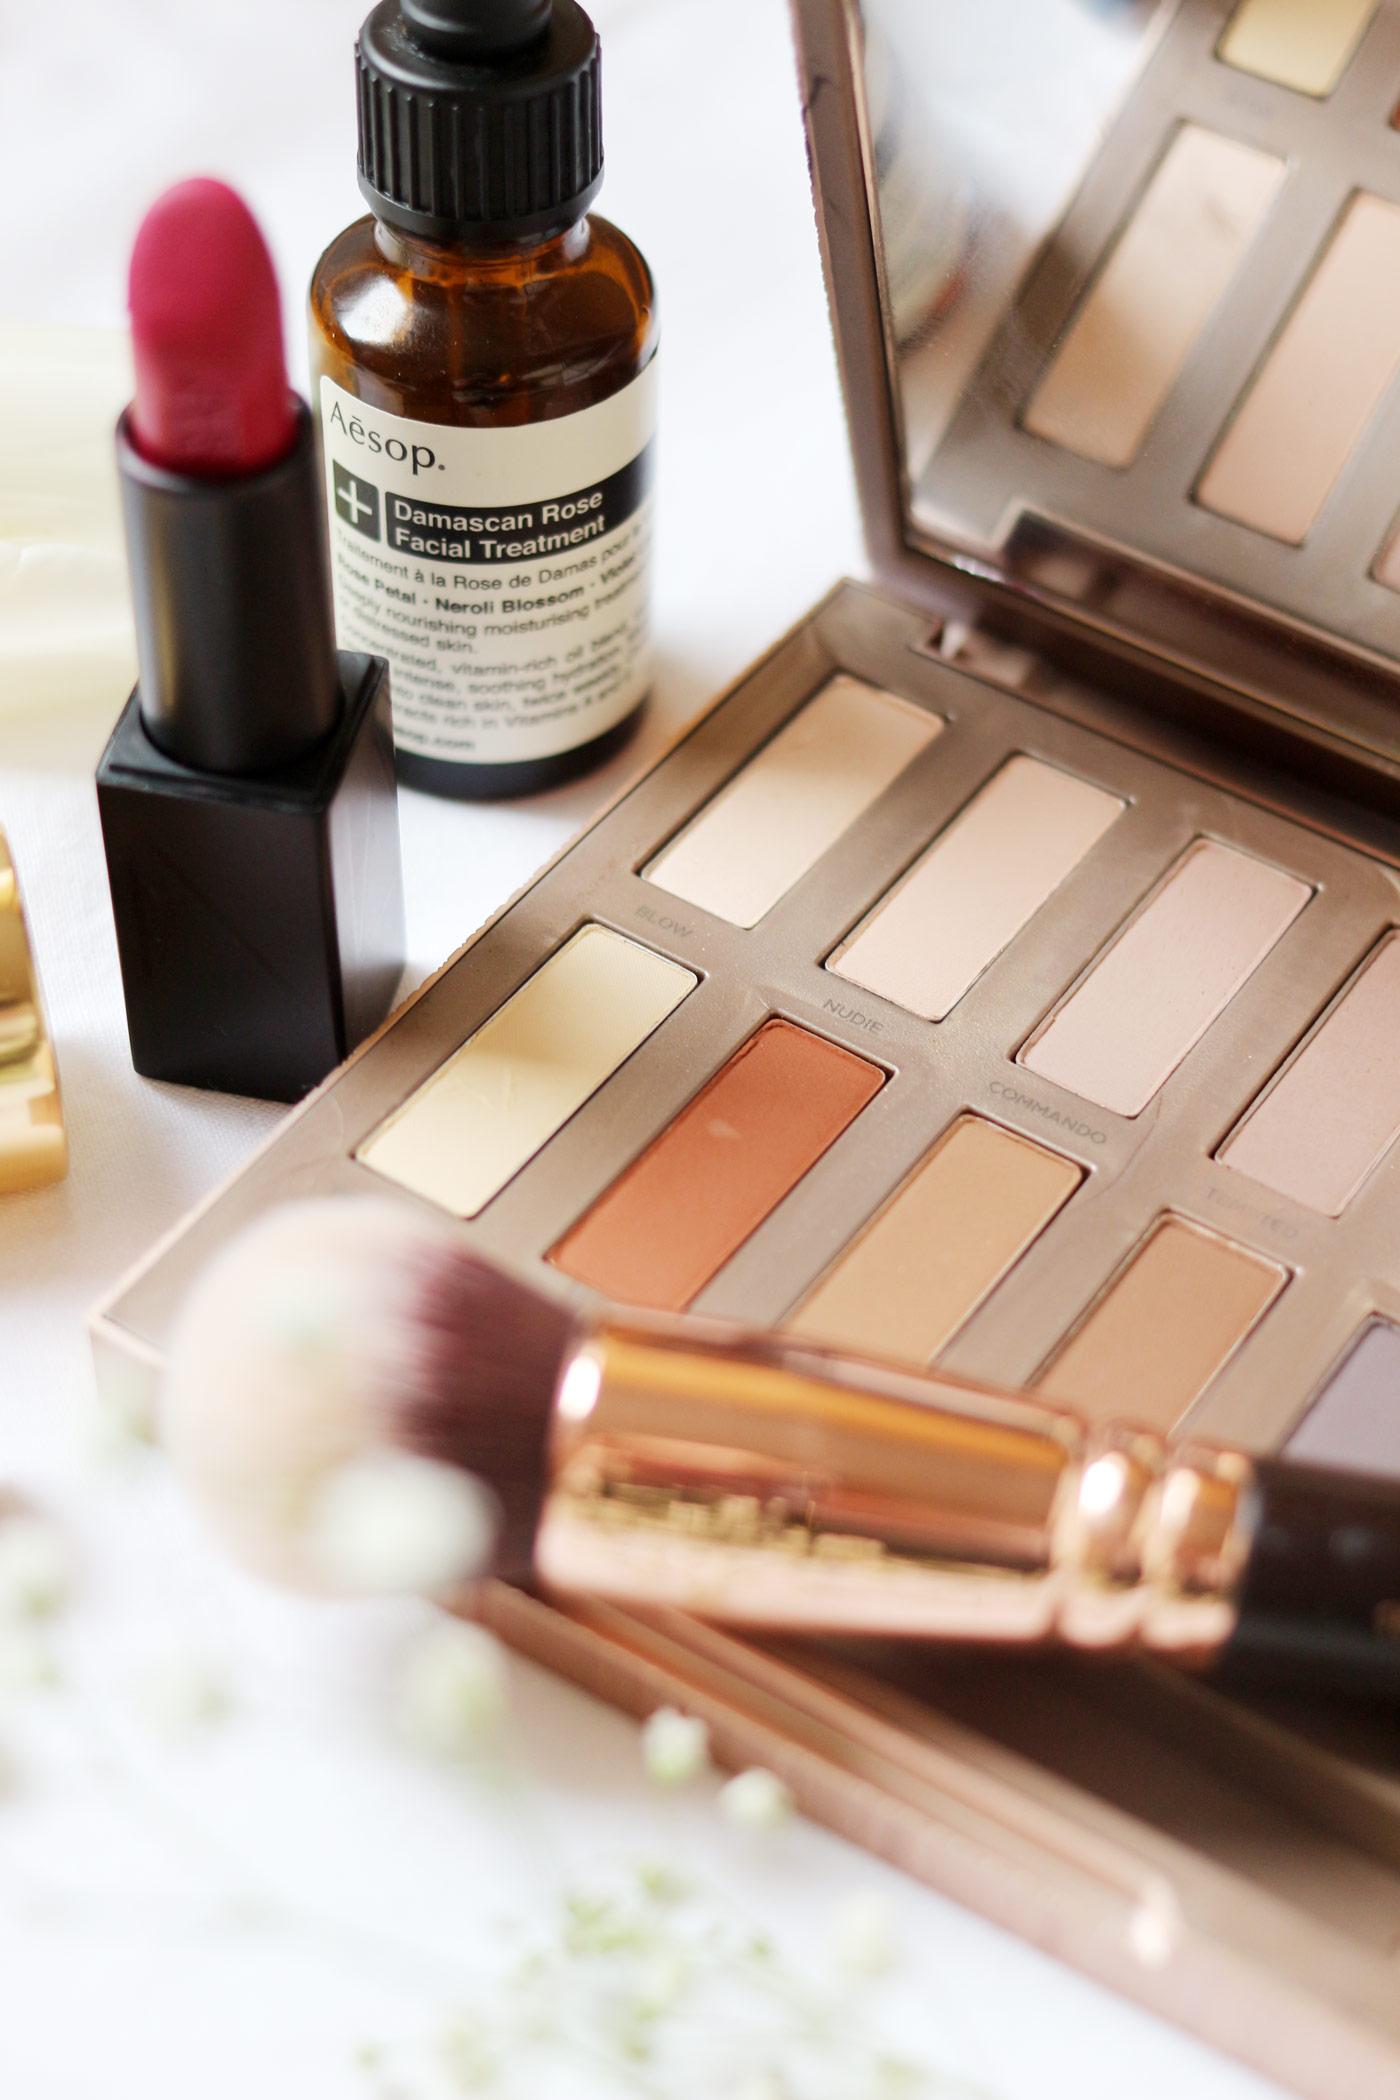 makeup-favourites-ysl-touche-eclat-foundation-NARS-vera-UD-naked-basics-1